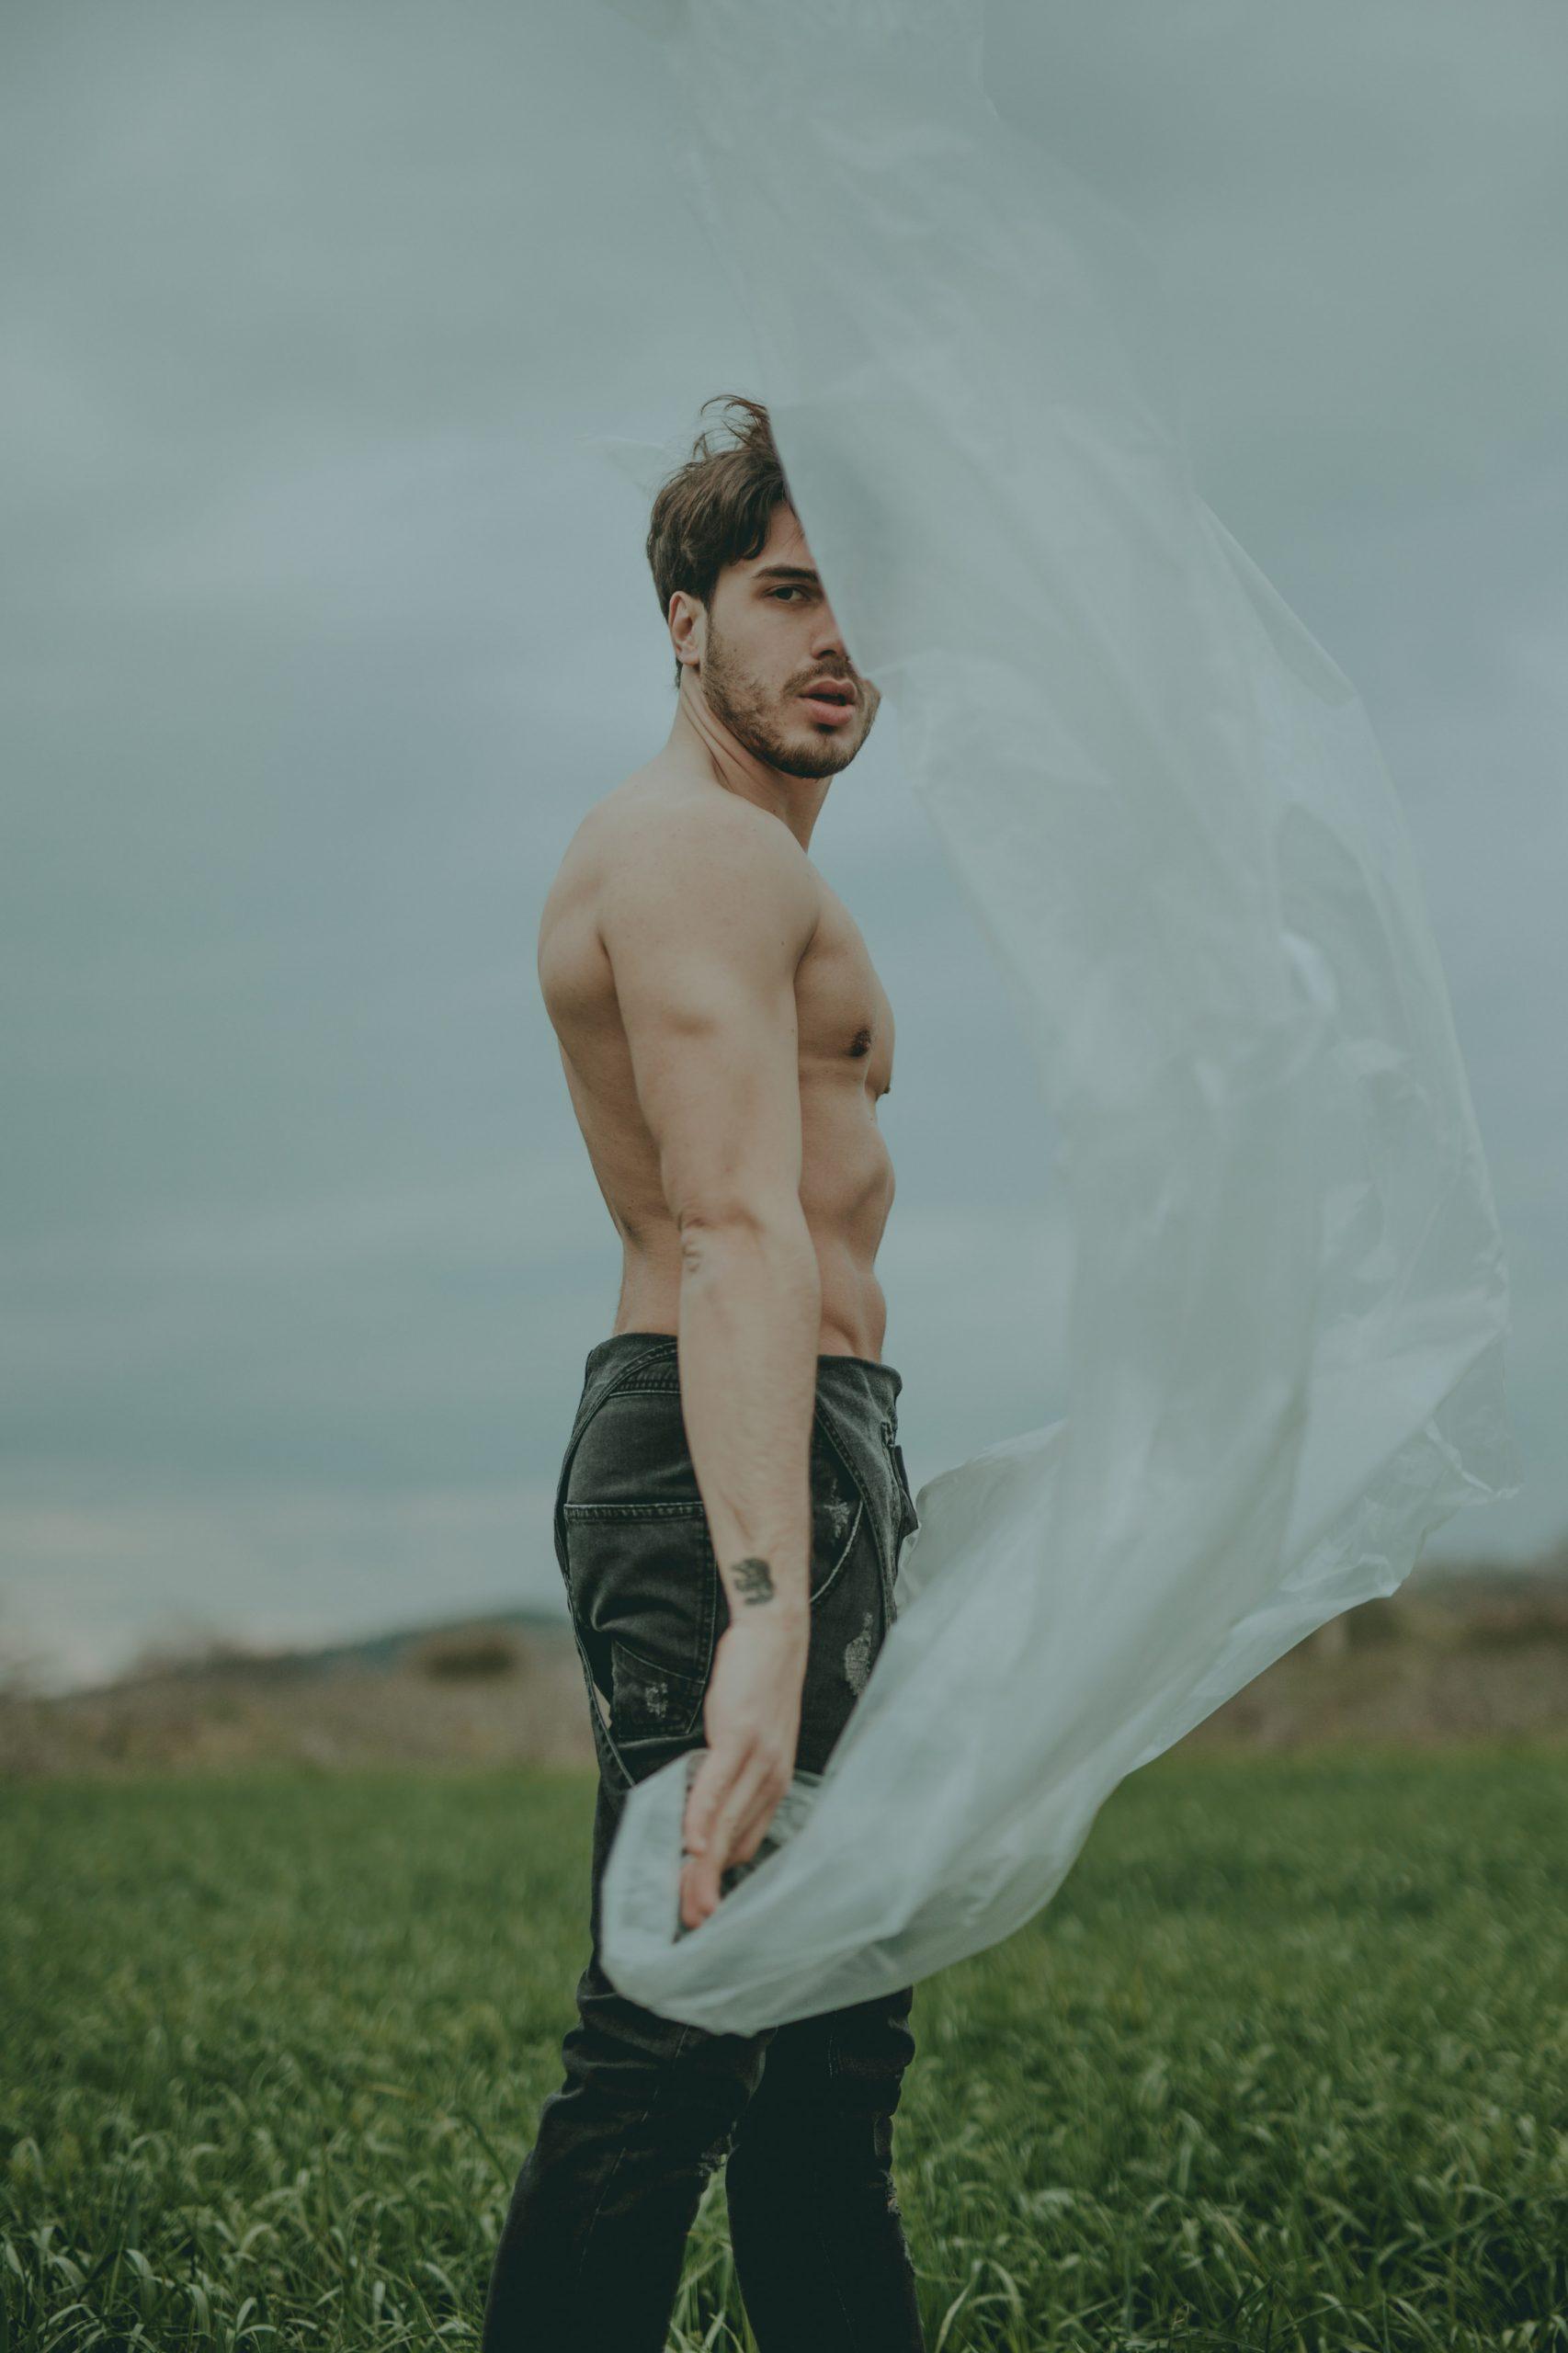 Categorie: Boudoir & Artistic Nude, Fine Art, Glamour, Portrait- Photographer: UMILE LIONETTI, - Model: ANDREA SANSEVERINI - Location: Bisignano, CS, Italia